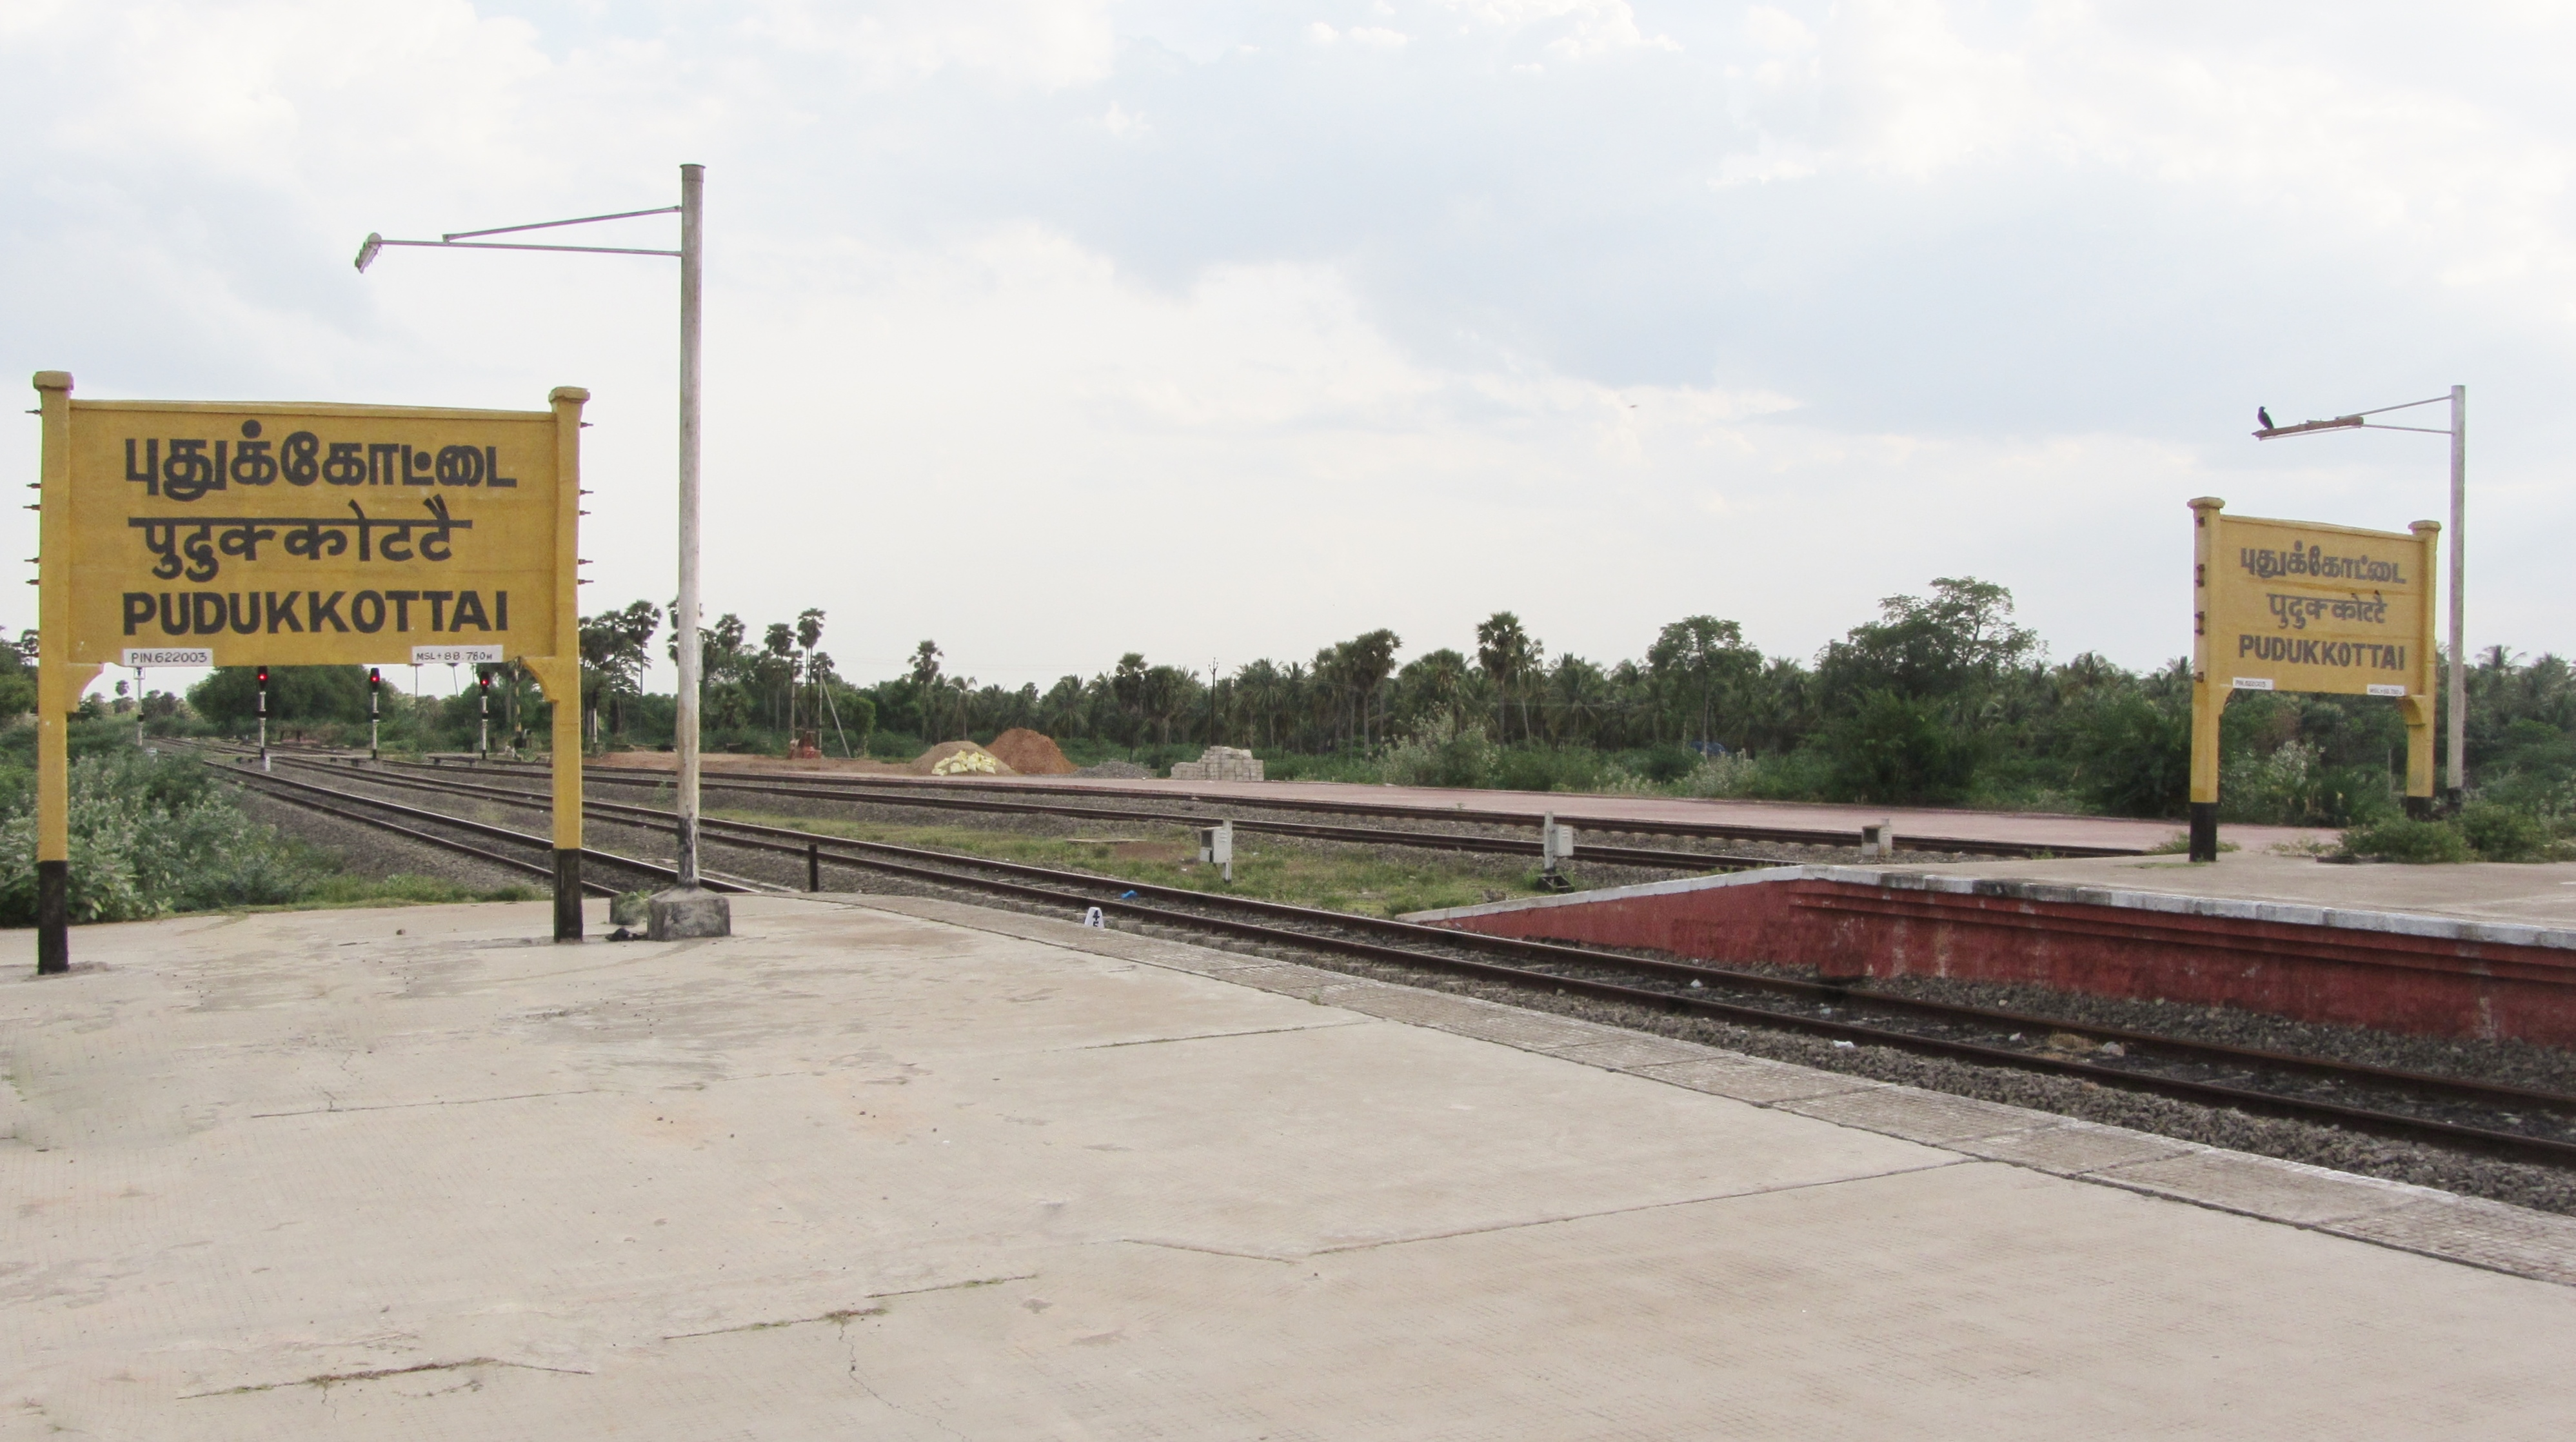 Pudukkottai railway station - Wikipedia